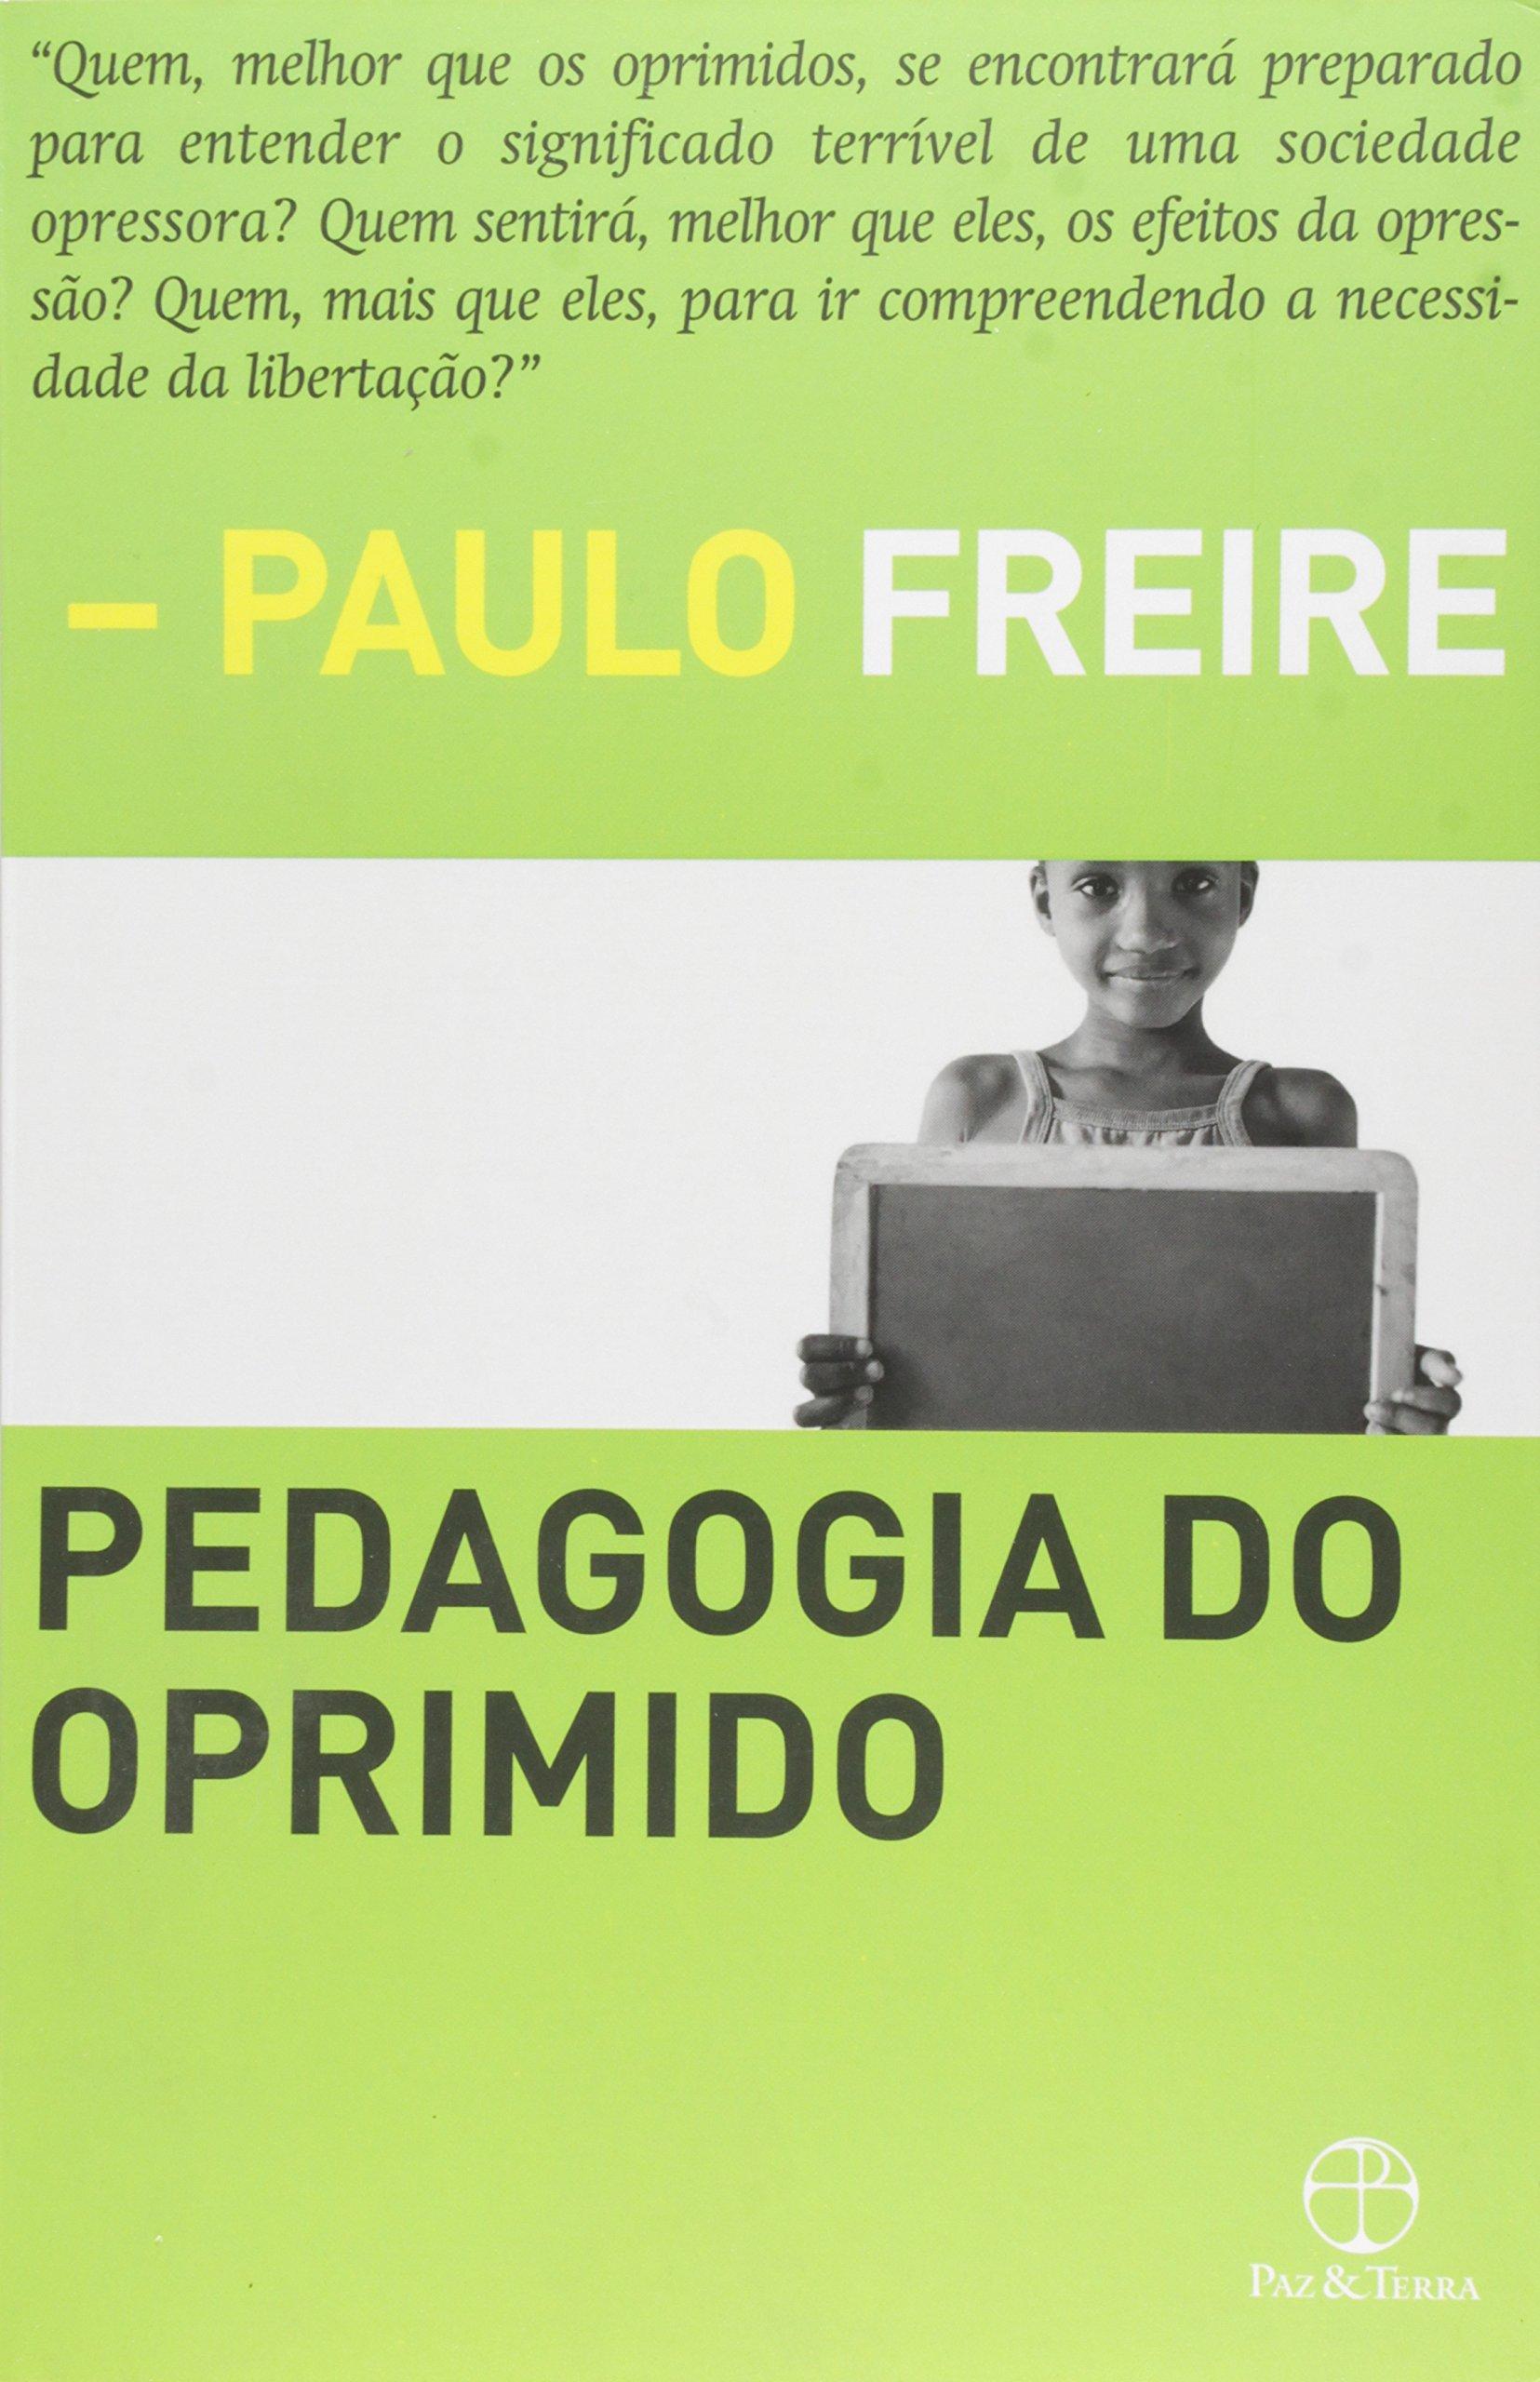 Pedagogia do oprimido by Paulo Freire